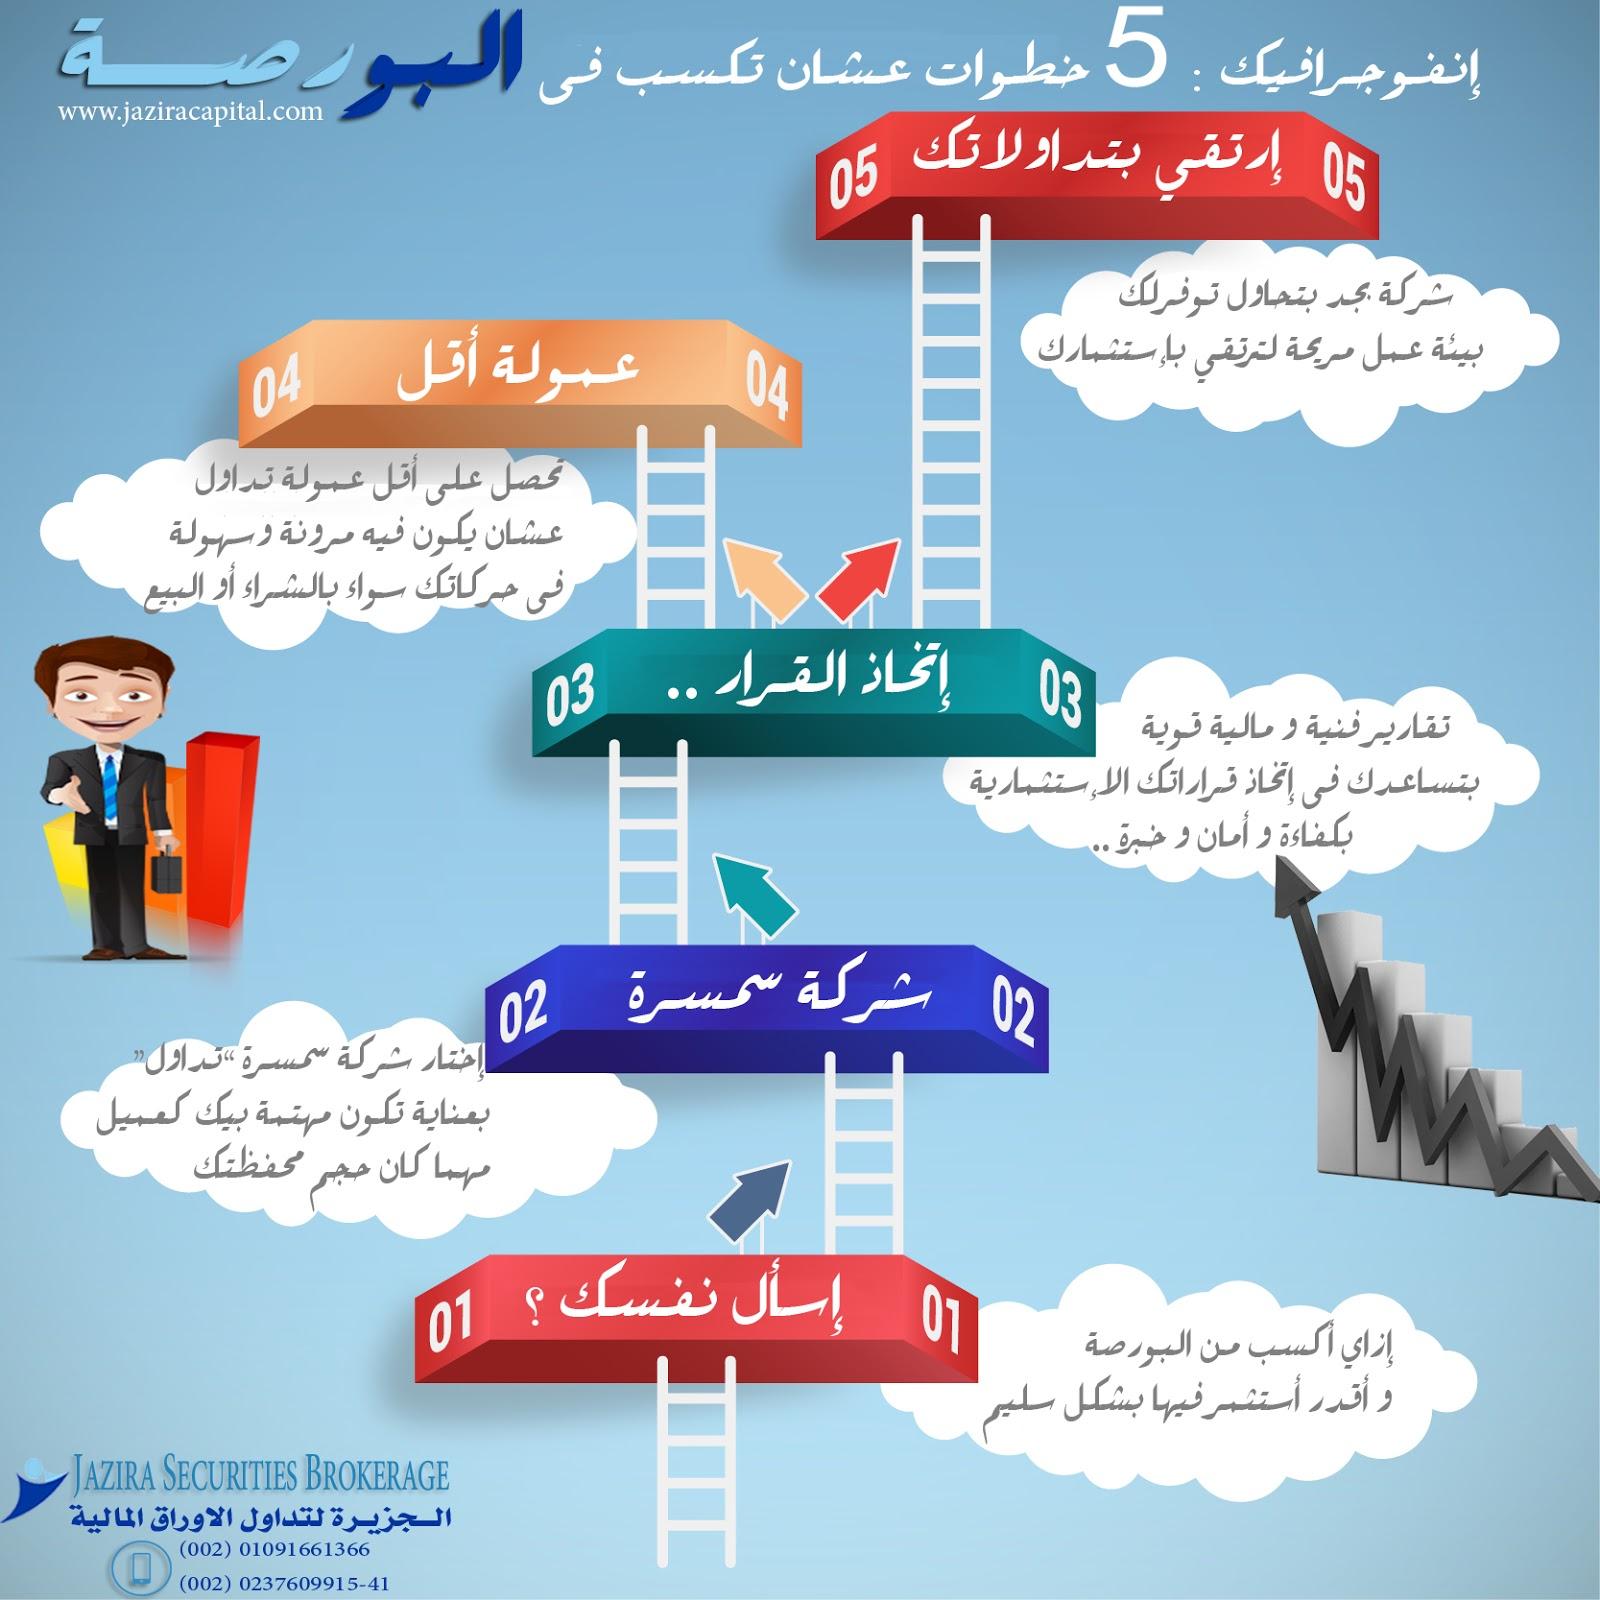 7fe2e2483e99f كيف تربح من البورصة المصرية ~ Jazira Securities Brokerage - الجزيرة لتداول  الاوراق المالية